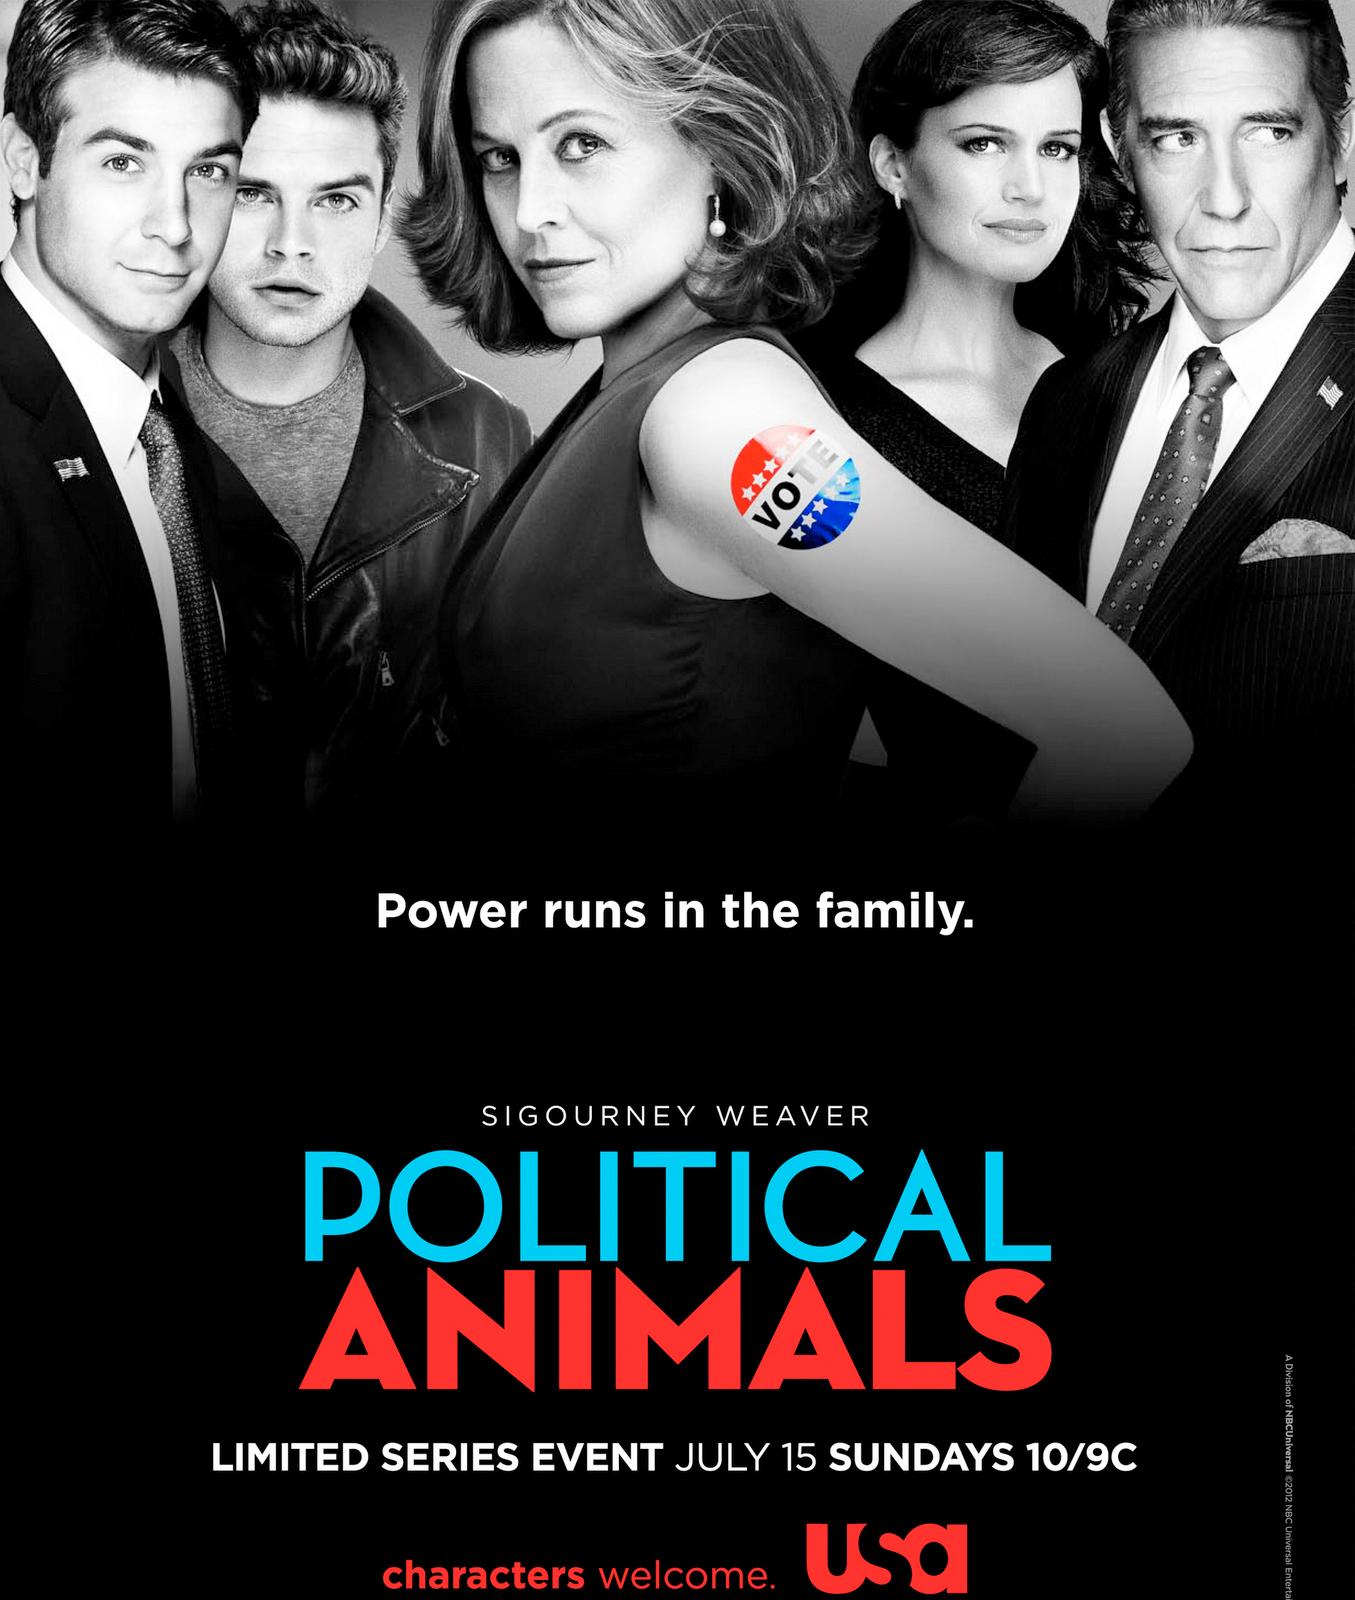 http://4.bp.blogspot.com/-moB0UmvicKo/UAWFrDunG5I/AAAAAAAAHvM/Tgx-W0ZjSIw/s1600/Political-Animals-poster.jpg